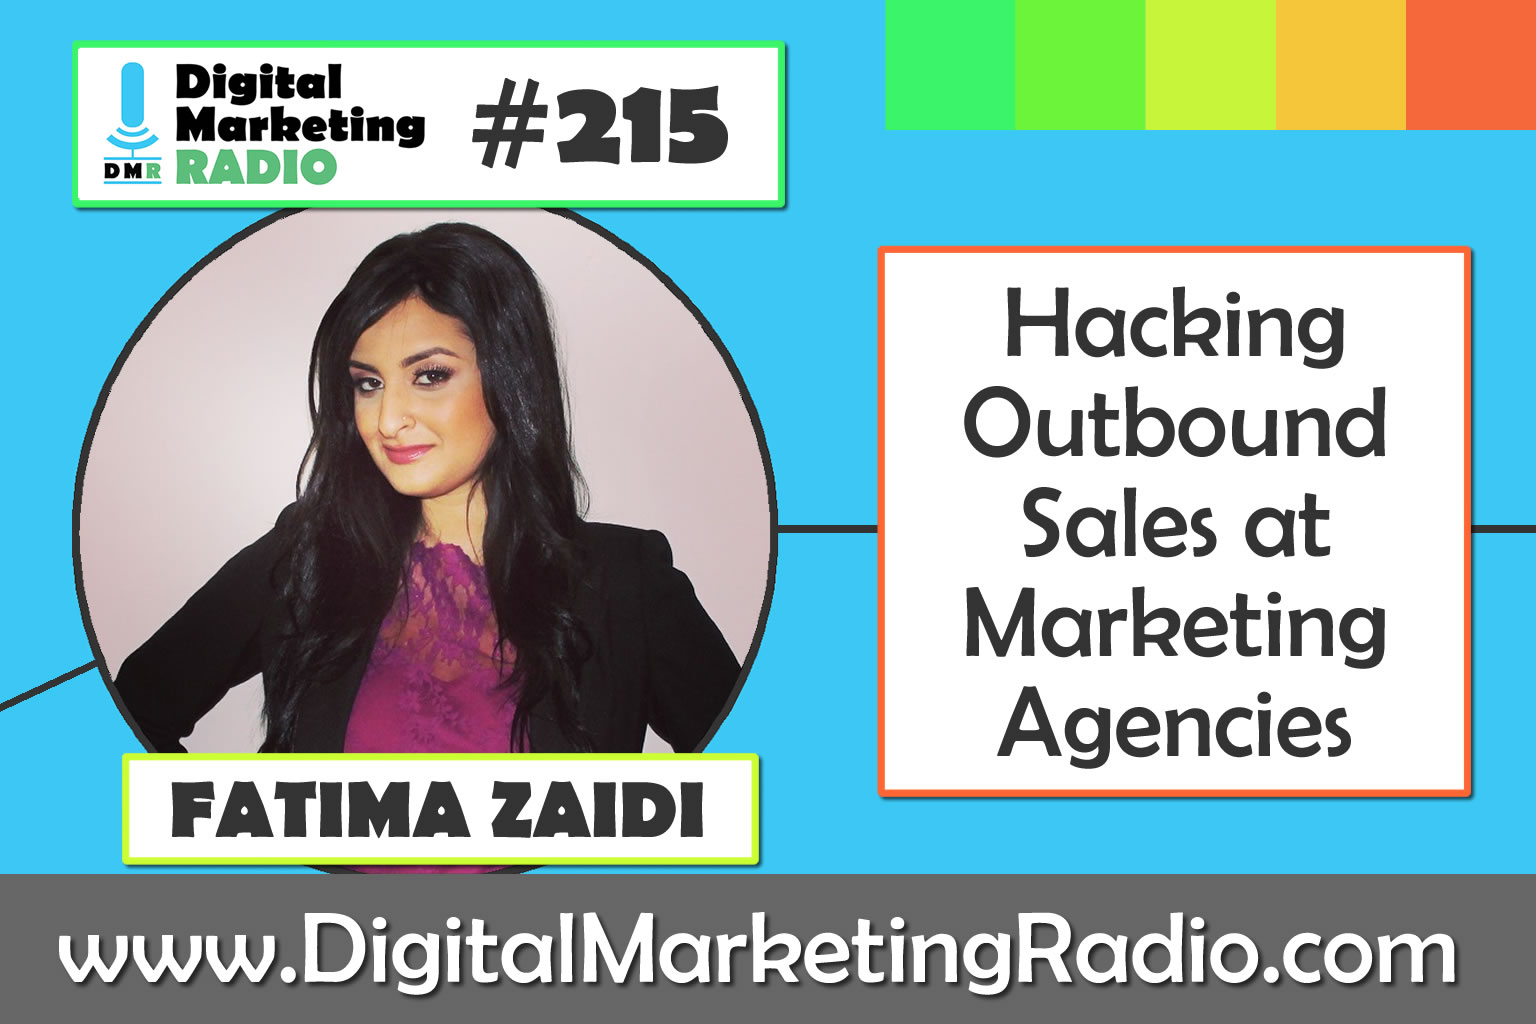 Hacking Outbound Sales at Marketing Agencies – FATIMA ZAIDI